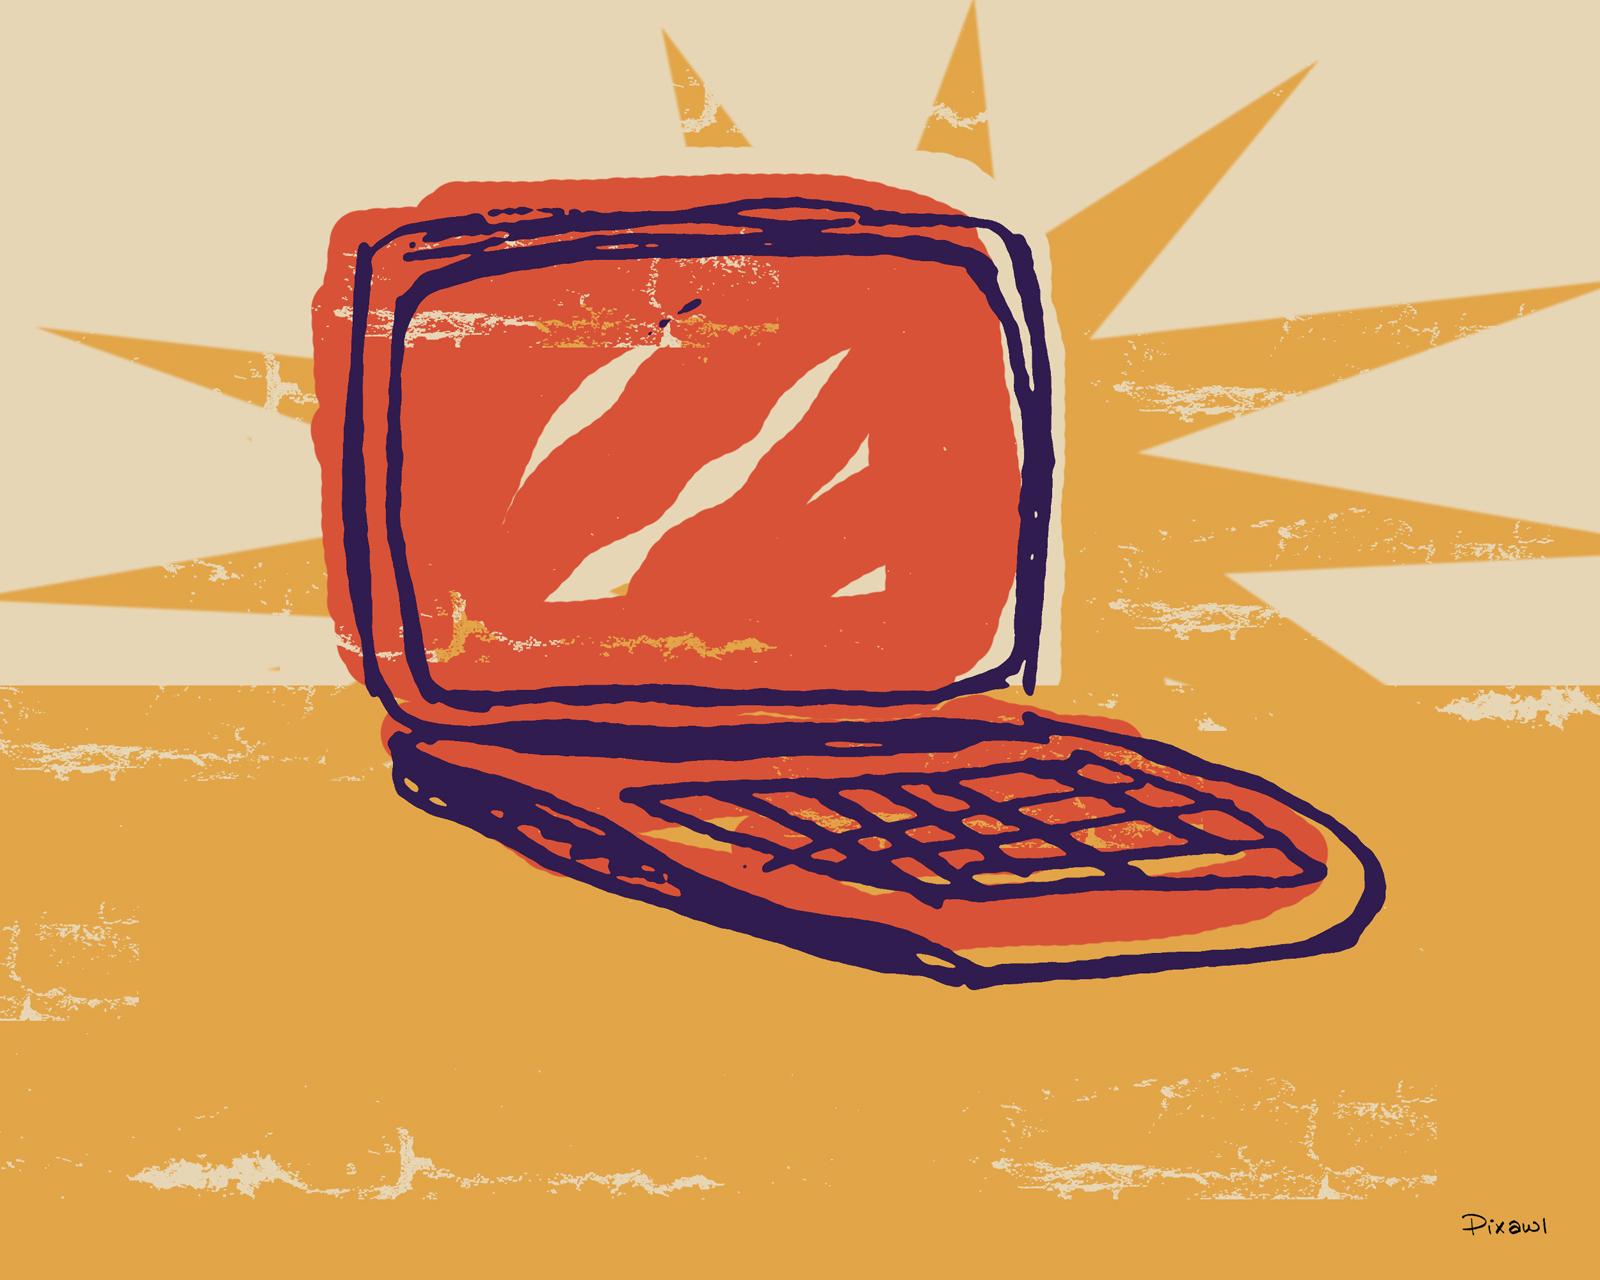 Advertising clipart internet. Free retro laptop illustration